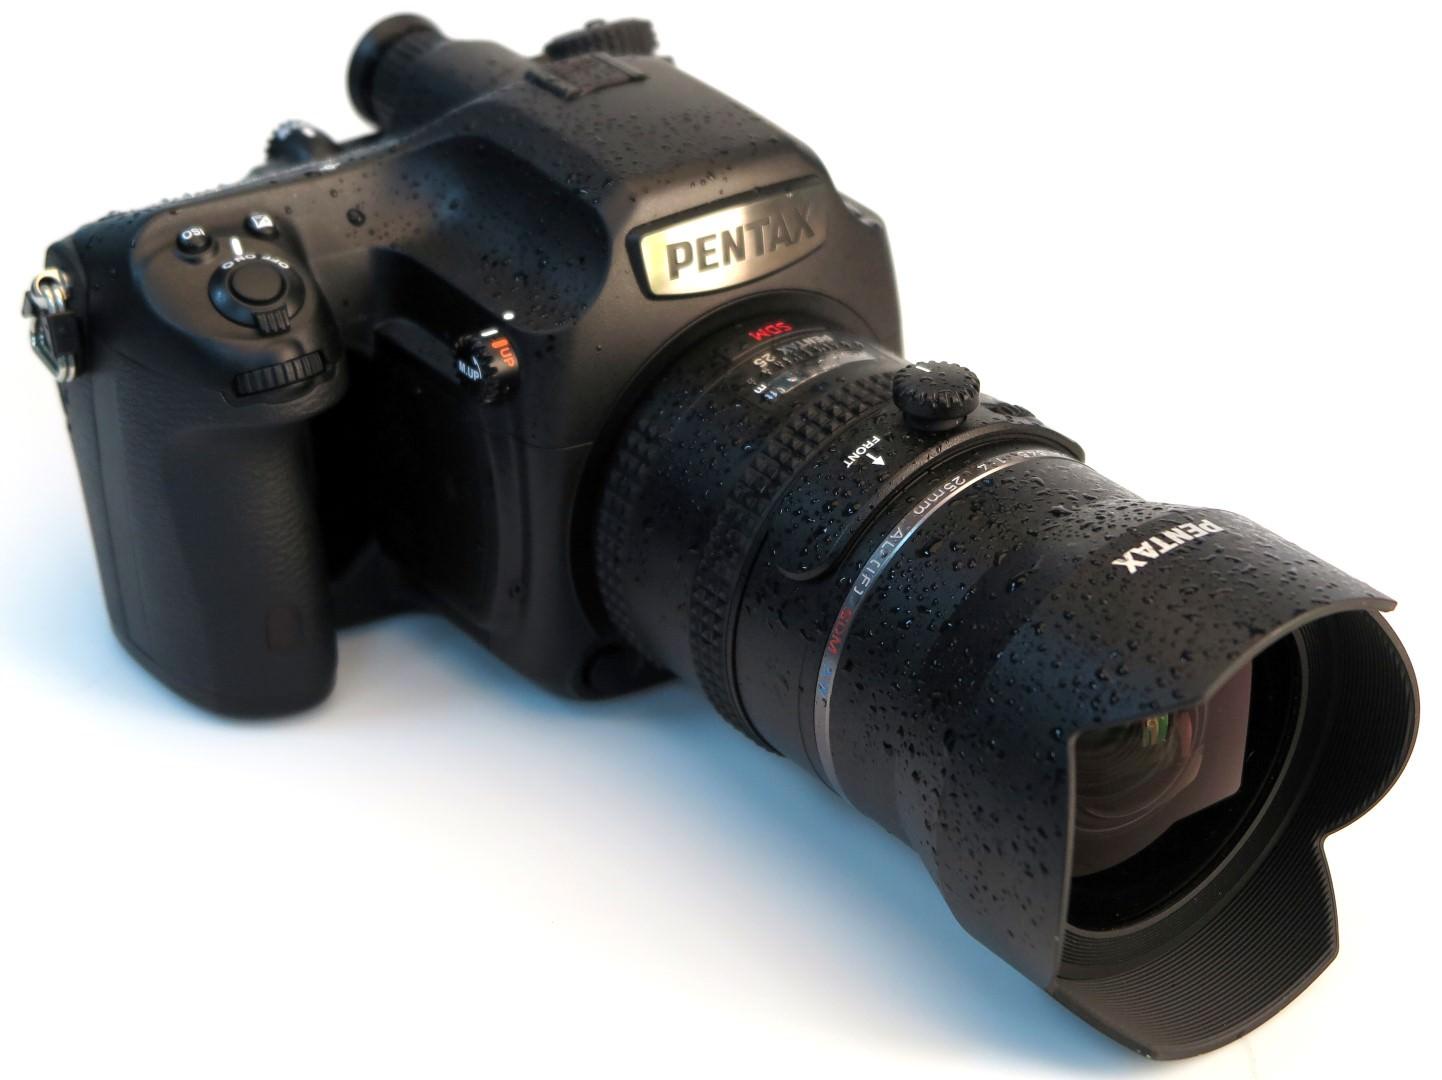 Camera Pentax Dslr Camera Reviews highres pentax 645z weather sealed wet 2 large 1401210795 jpg dslr camera